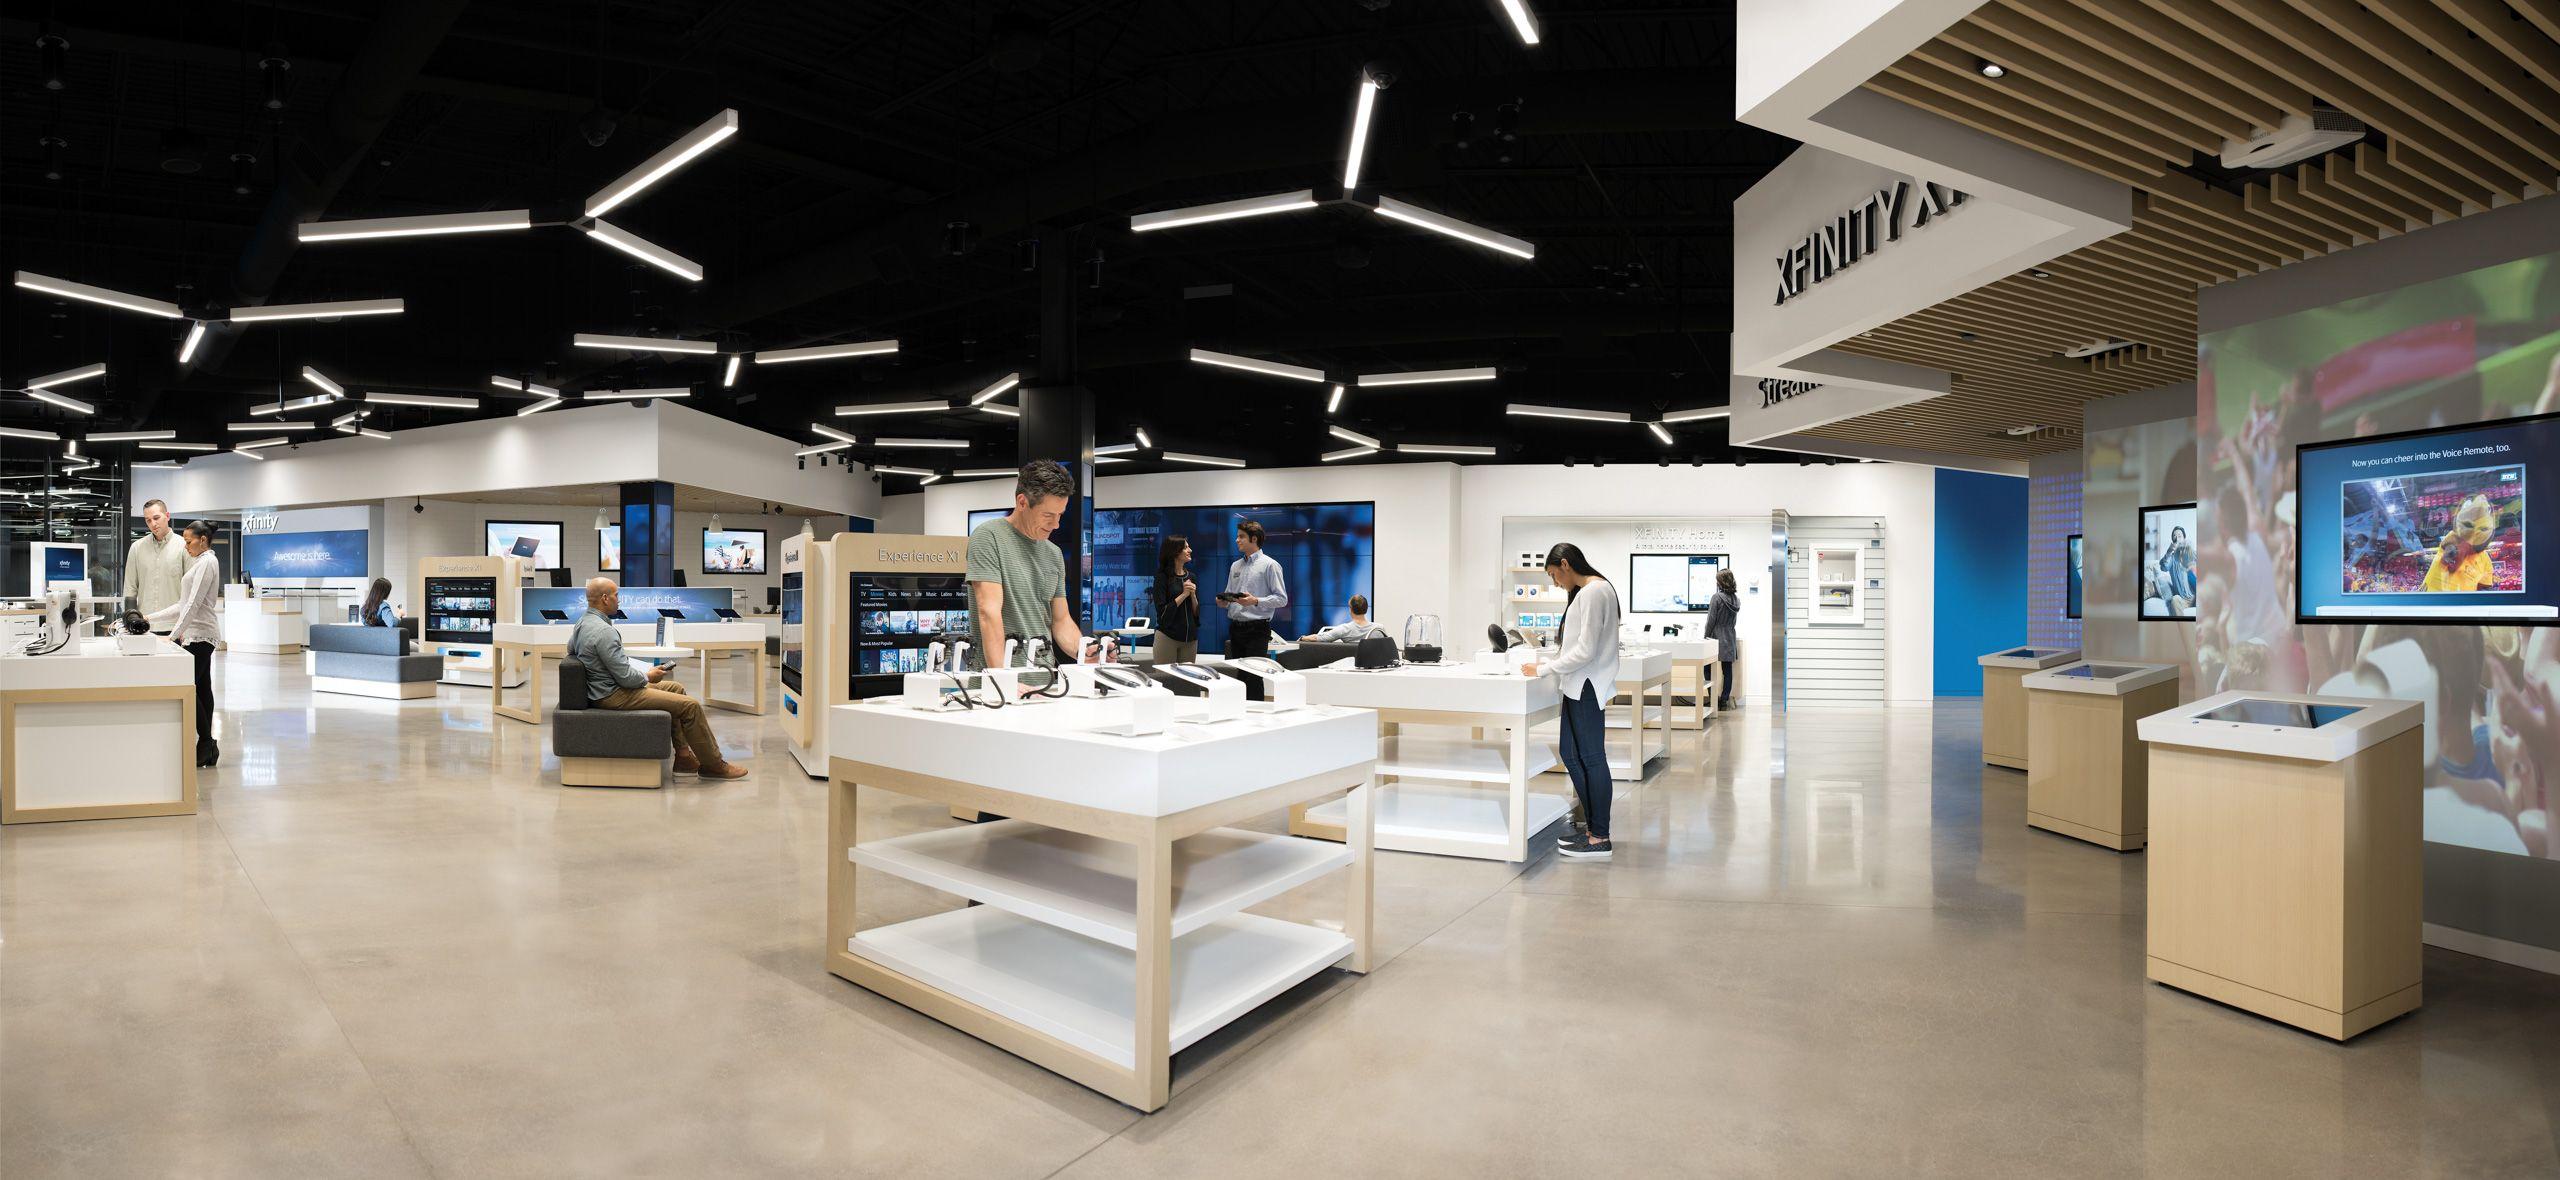 Retail-12.jpg